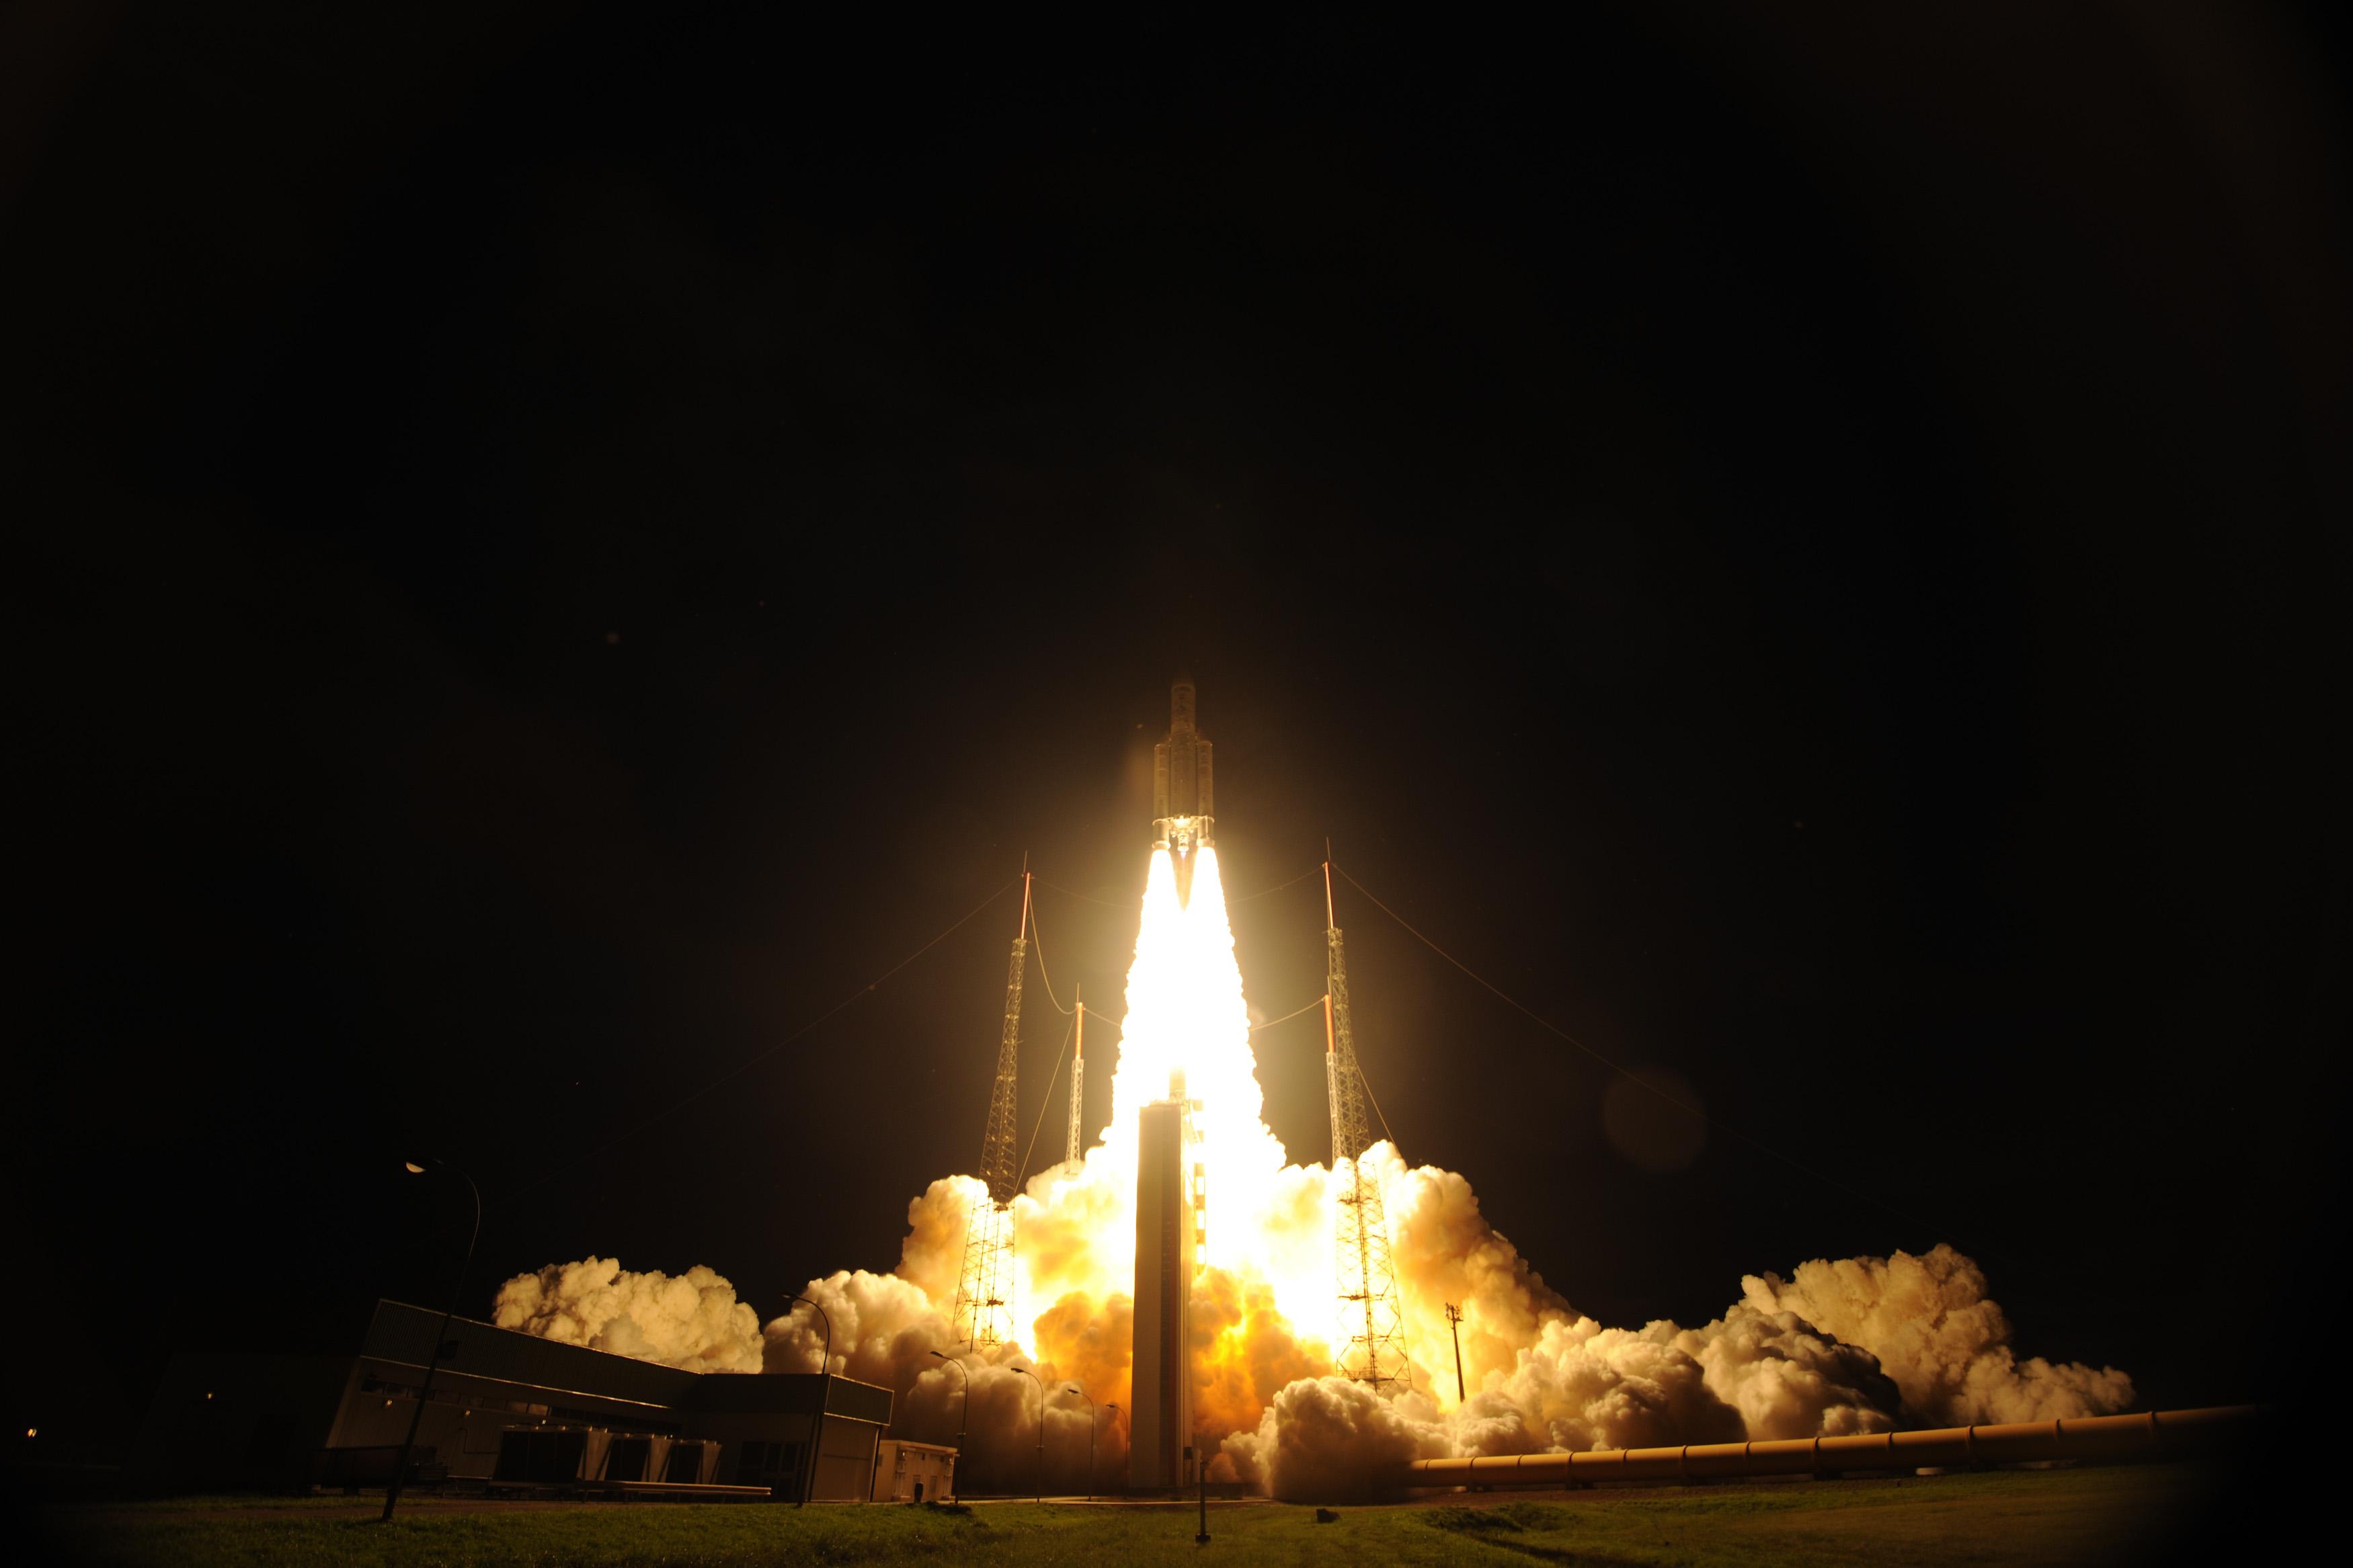 Take Off of Ariane 5 VA213 with ATV-4